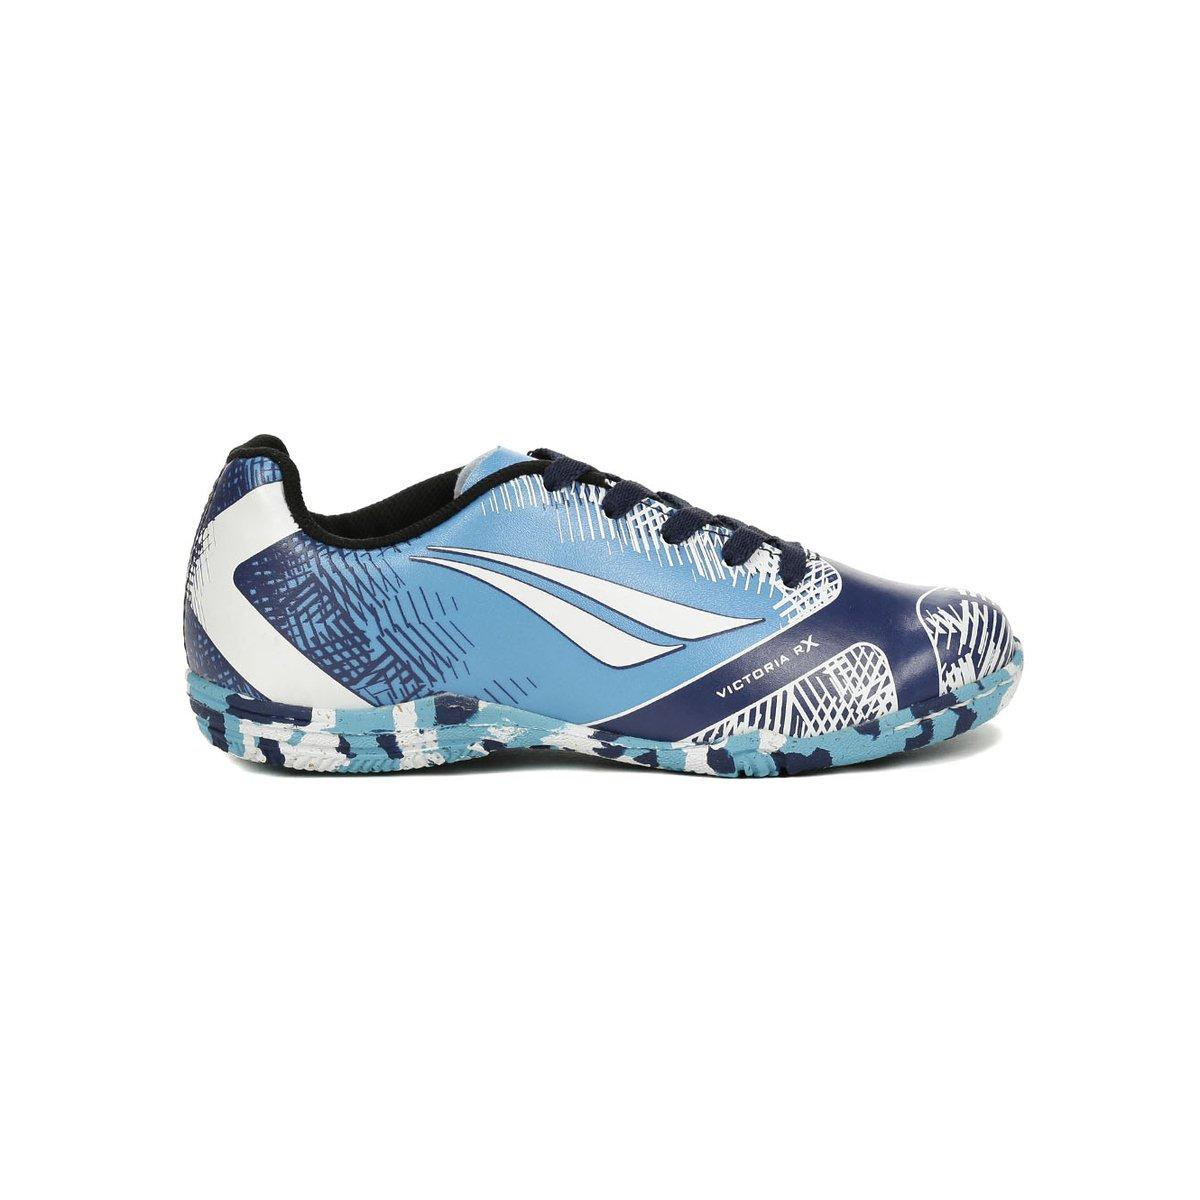 c81a41ffc3 ... Tênis Futsal Infantil Para Menino - Penalty Azul marinho branco ...